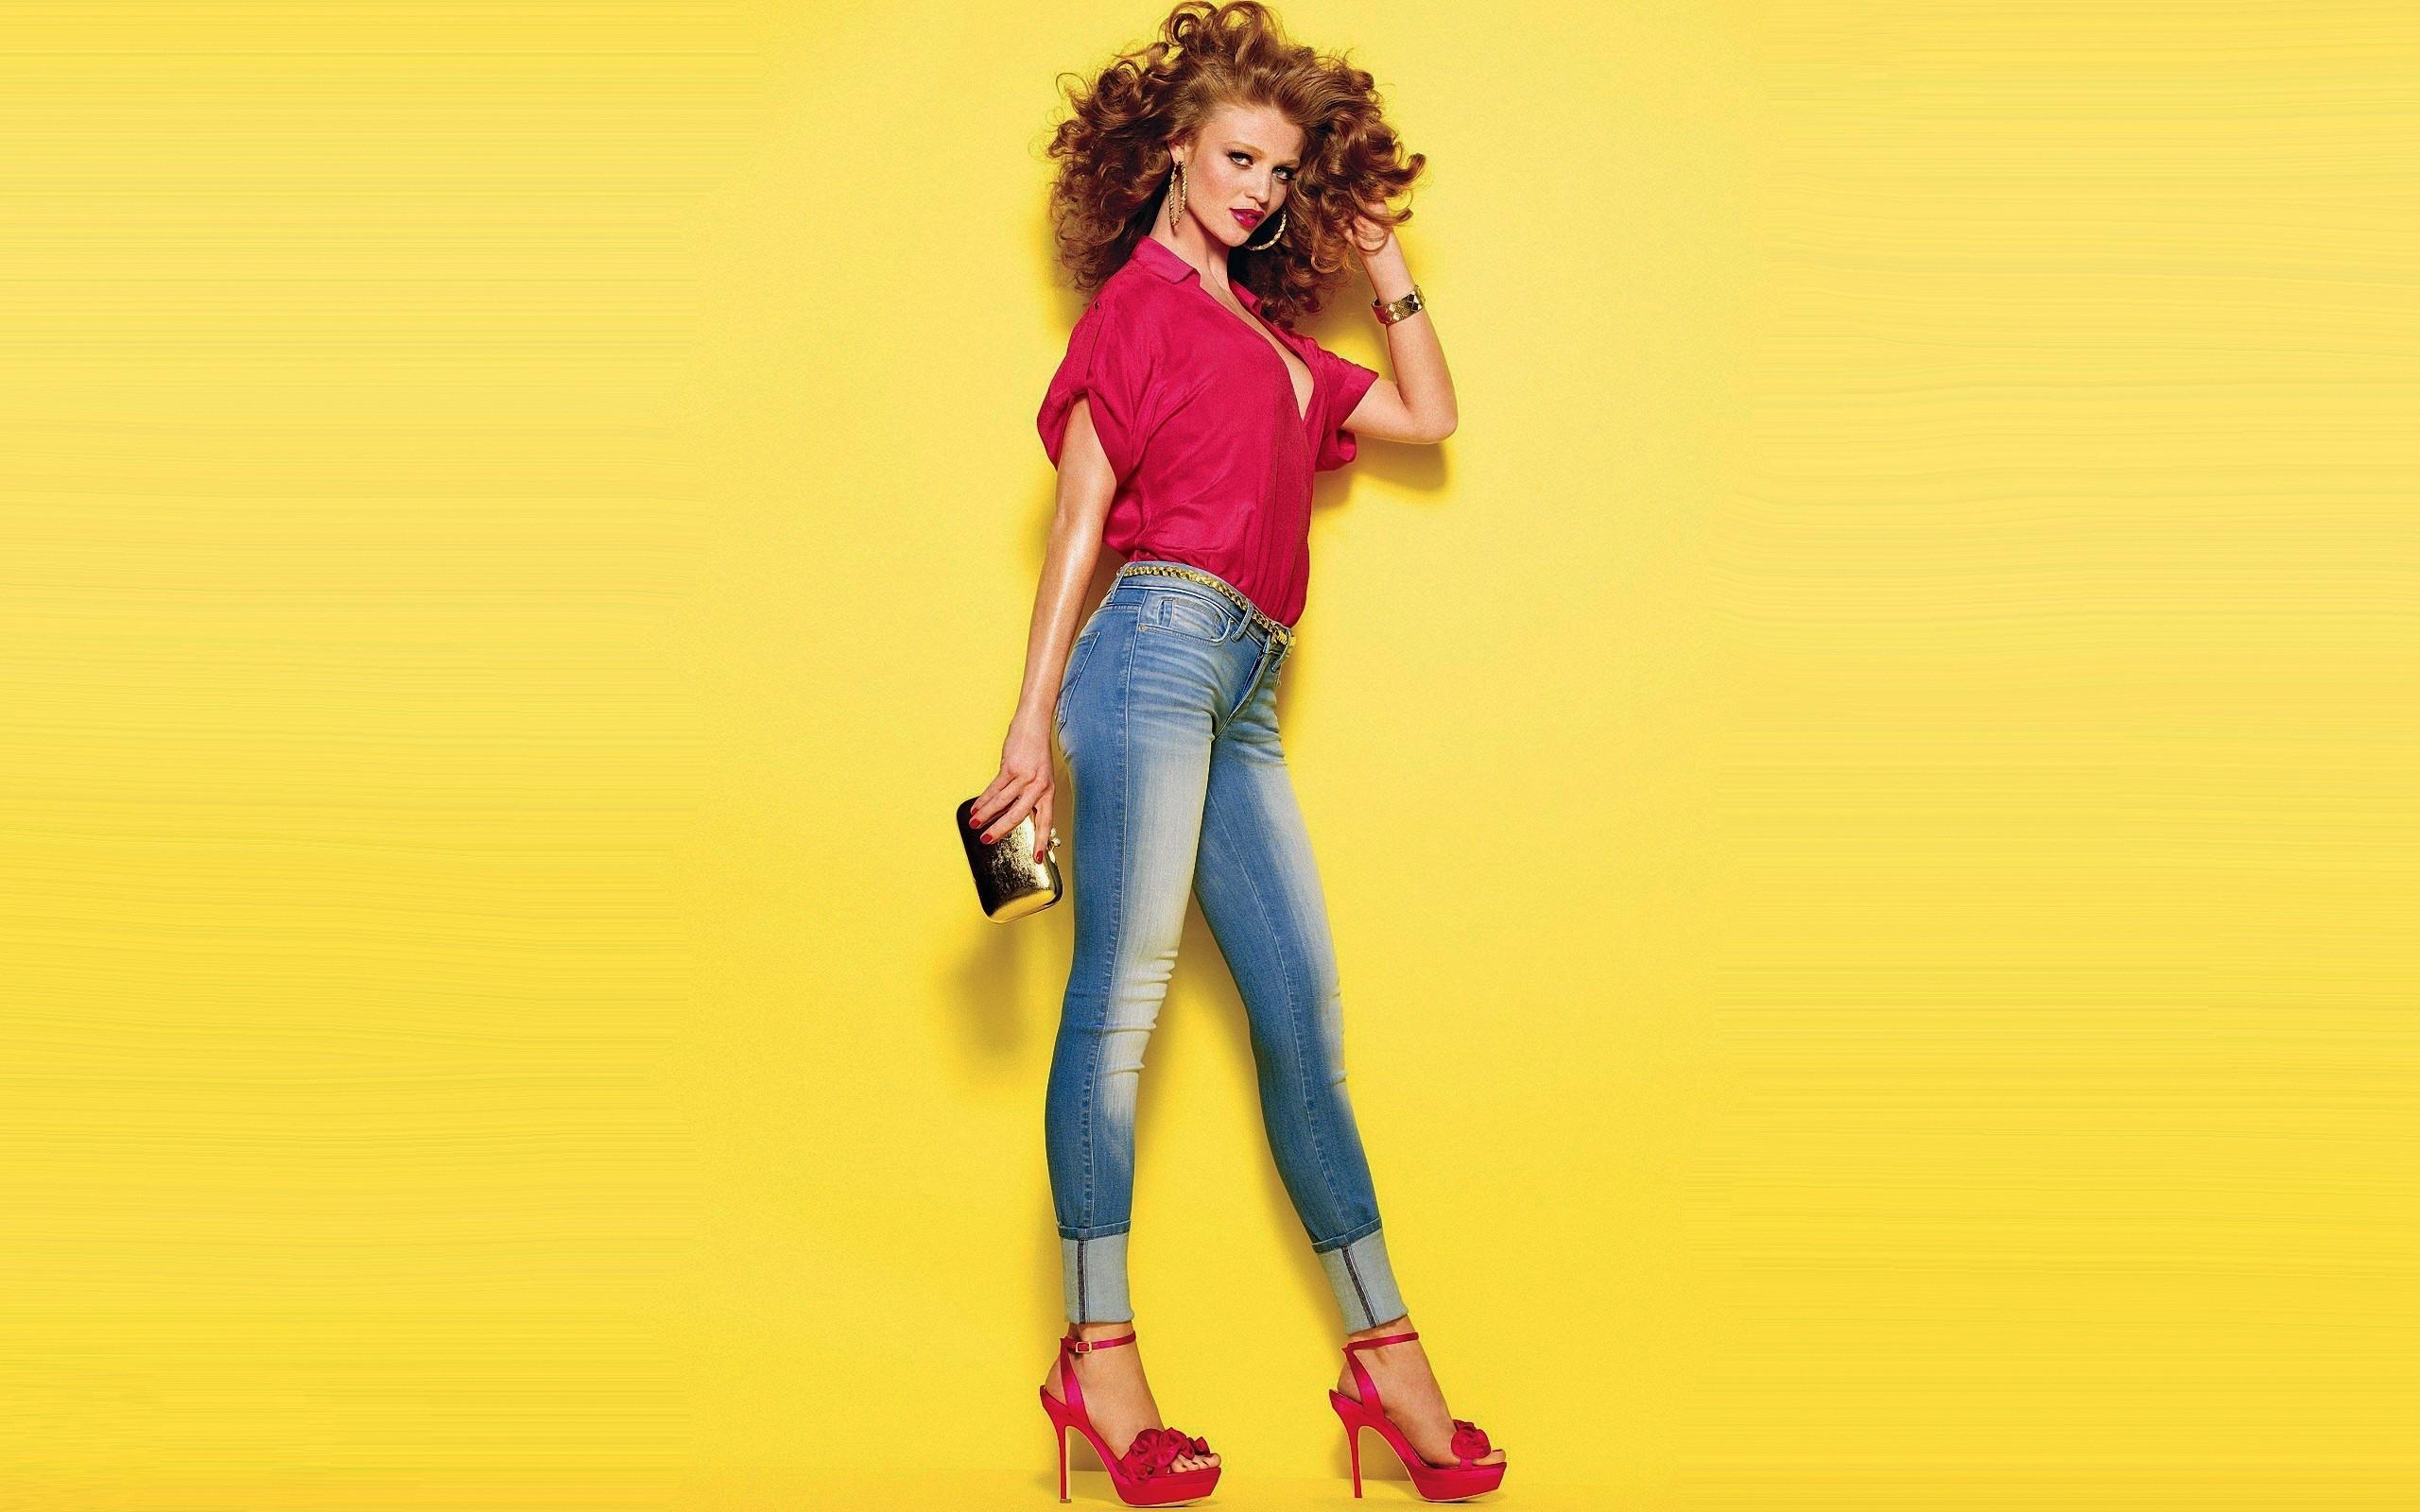 Wallpaper model jeans style show 2560x1600 wallup - Is wallpaper in style ...